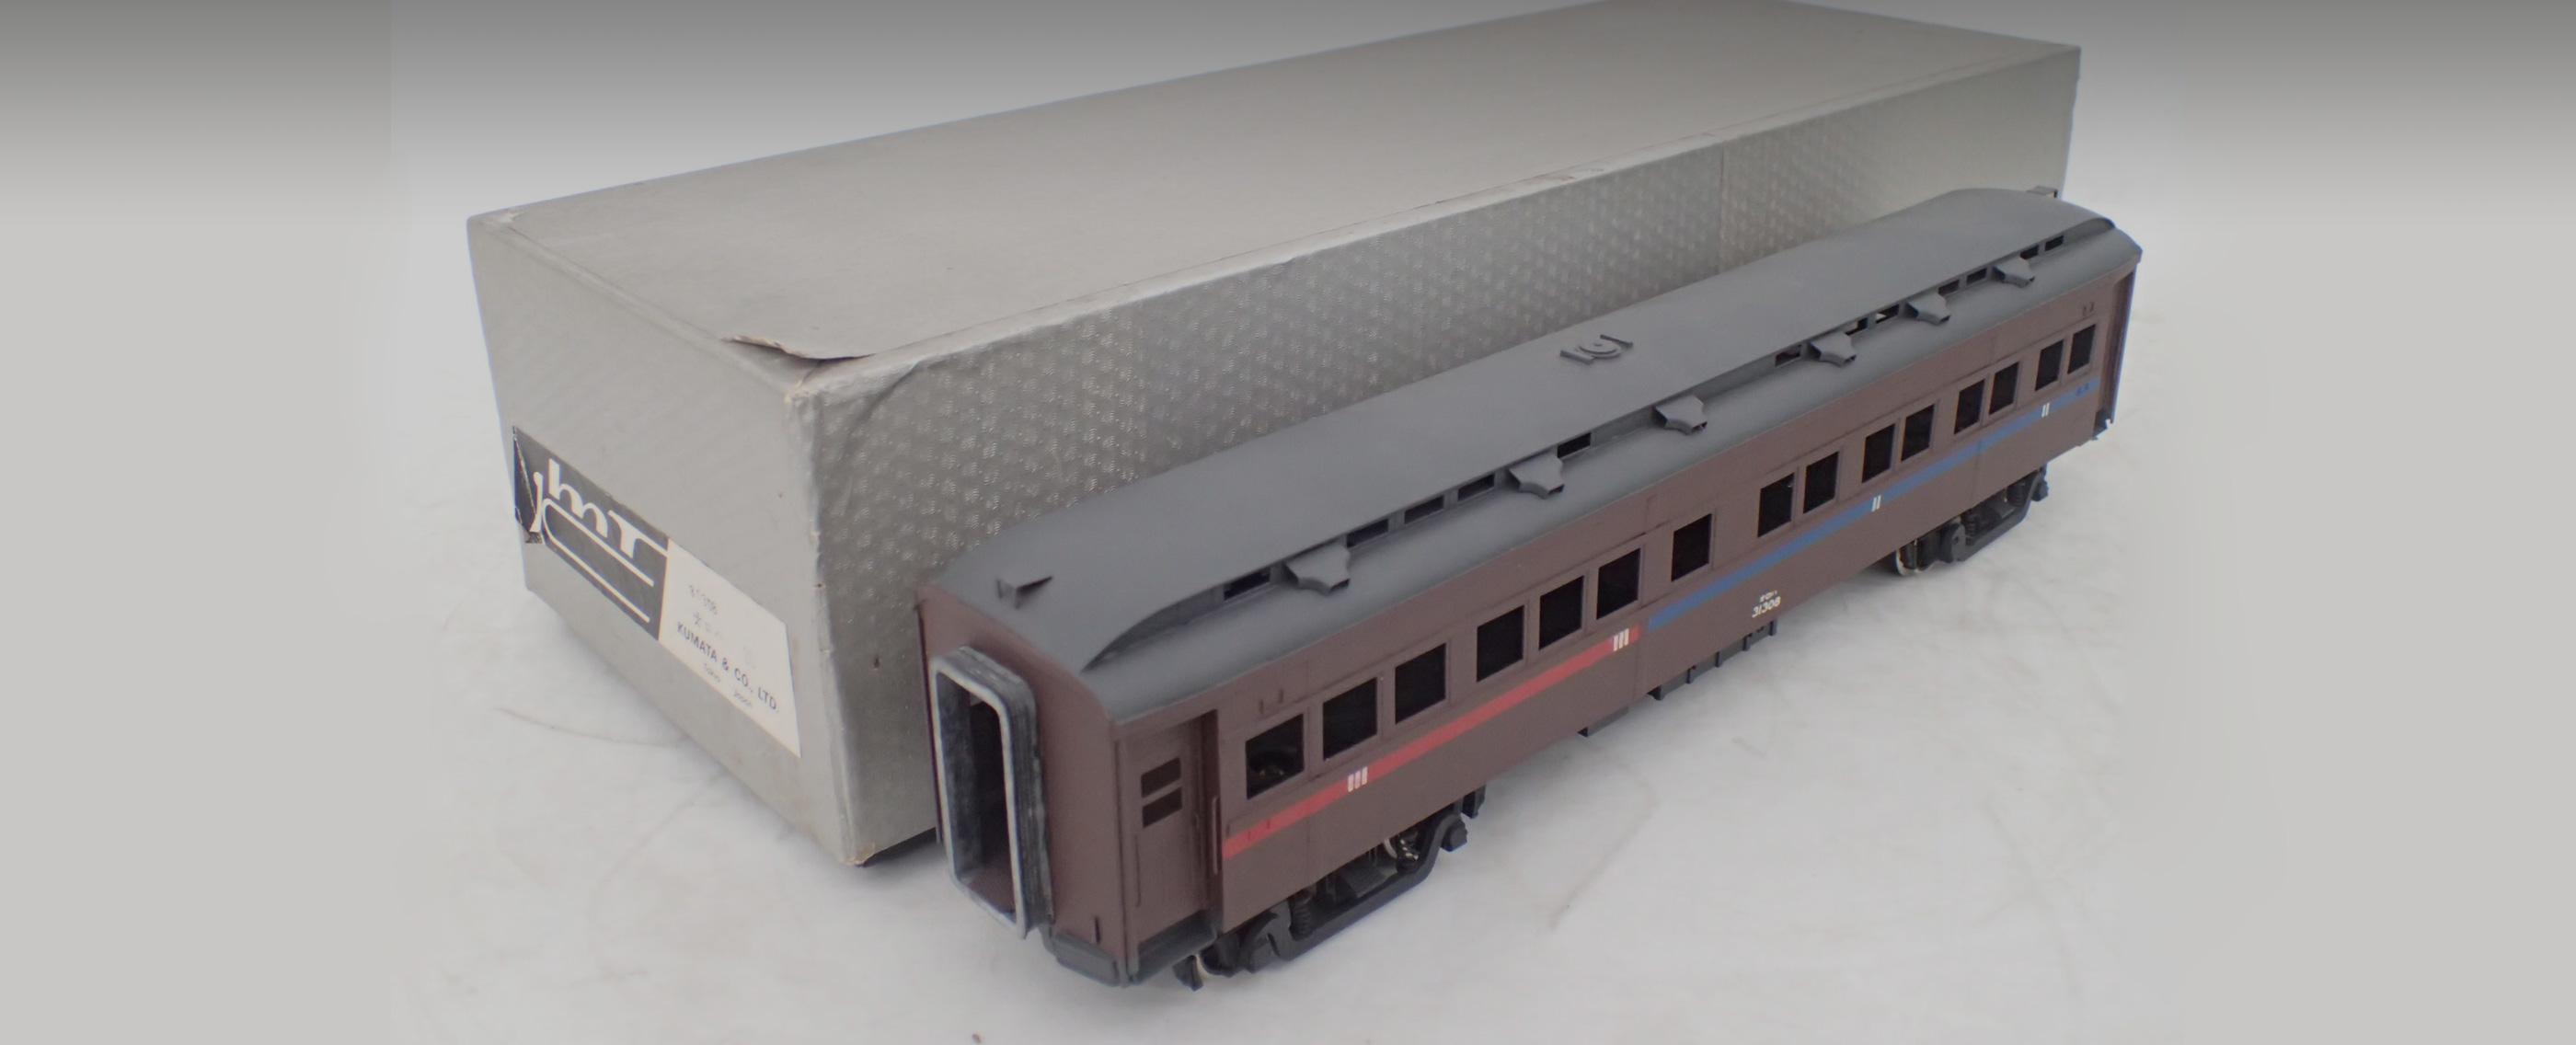 Oゲージの鉄道模型